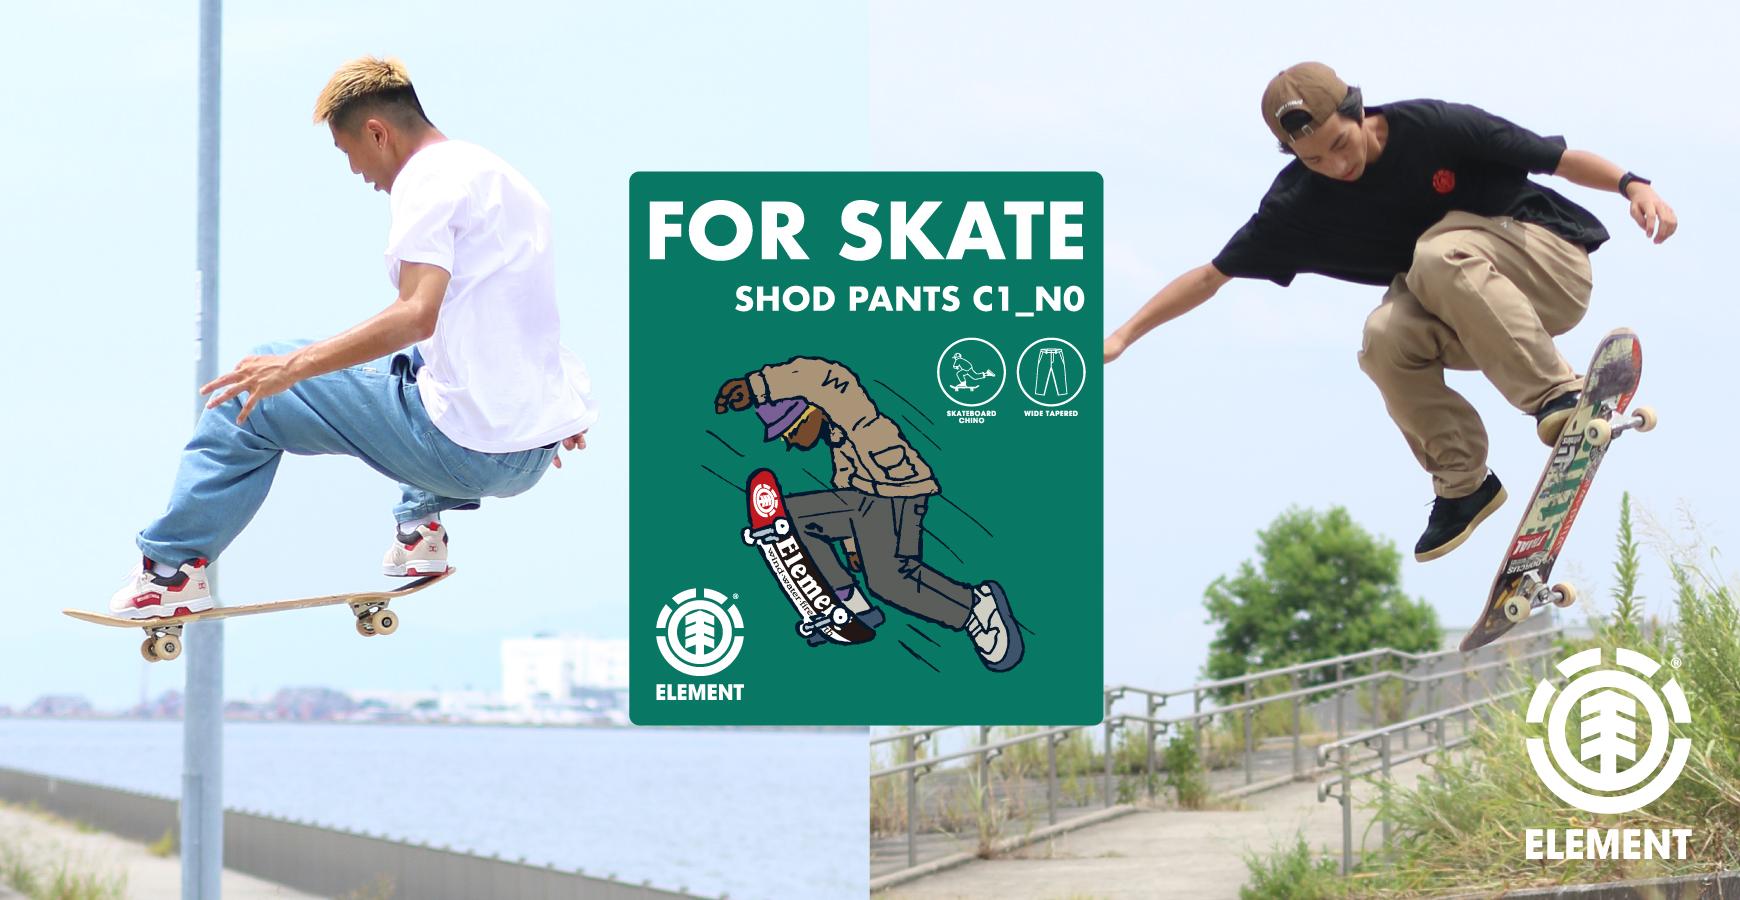 SHOD PANTS & SHIRTS 02